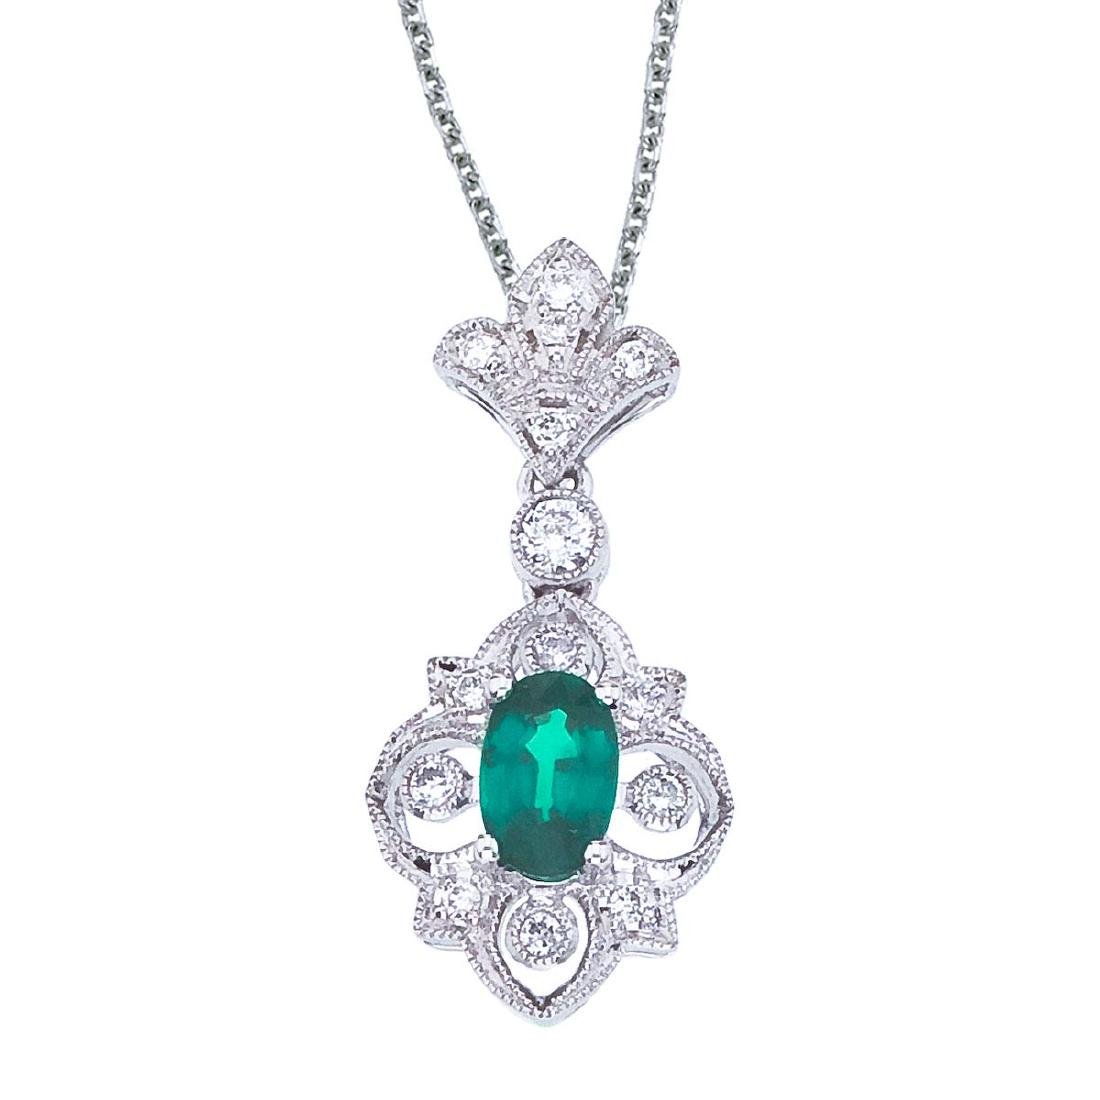 Certified 14k White Gold Emerald and Diamond Fleur De L